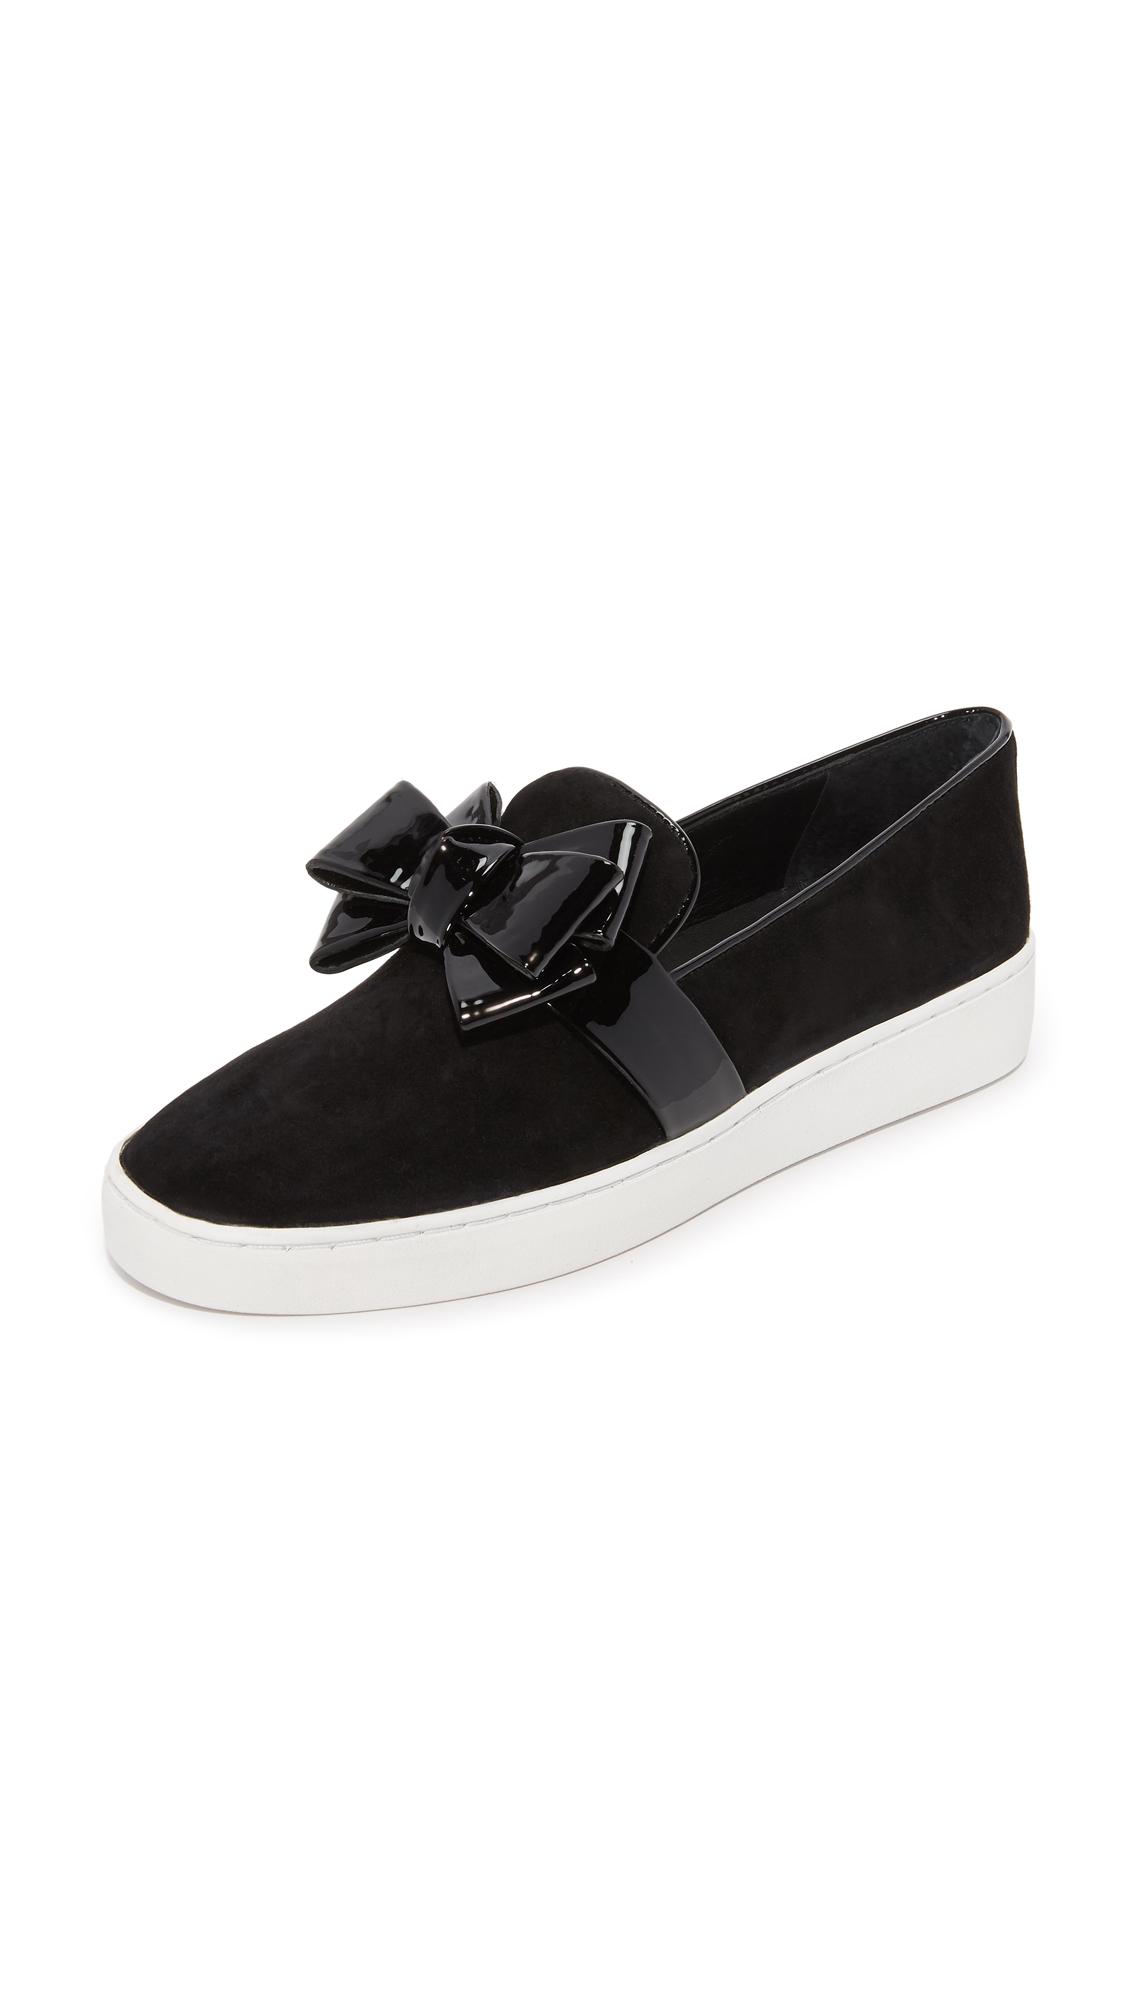 michael kors female 188971 michael kors collection val slip on sneakers black